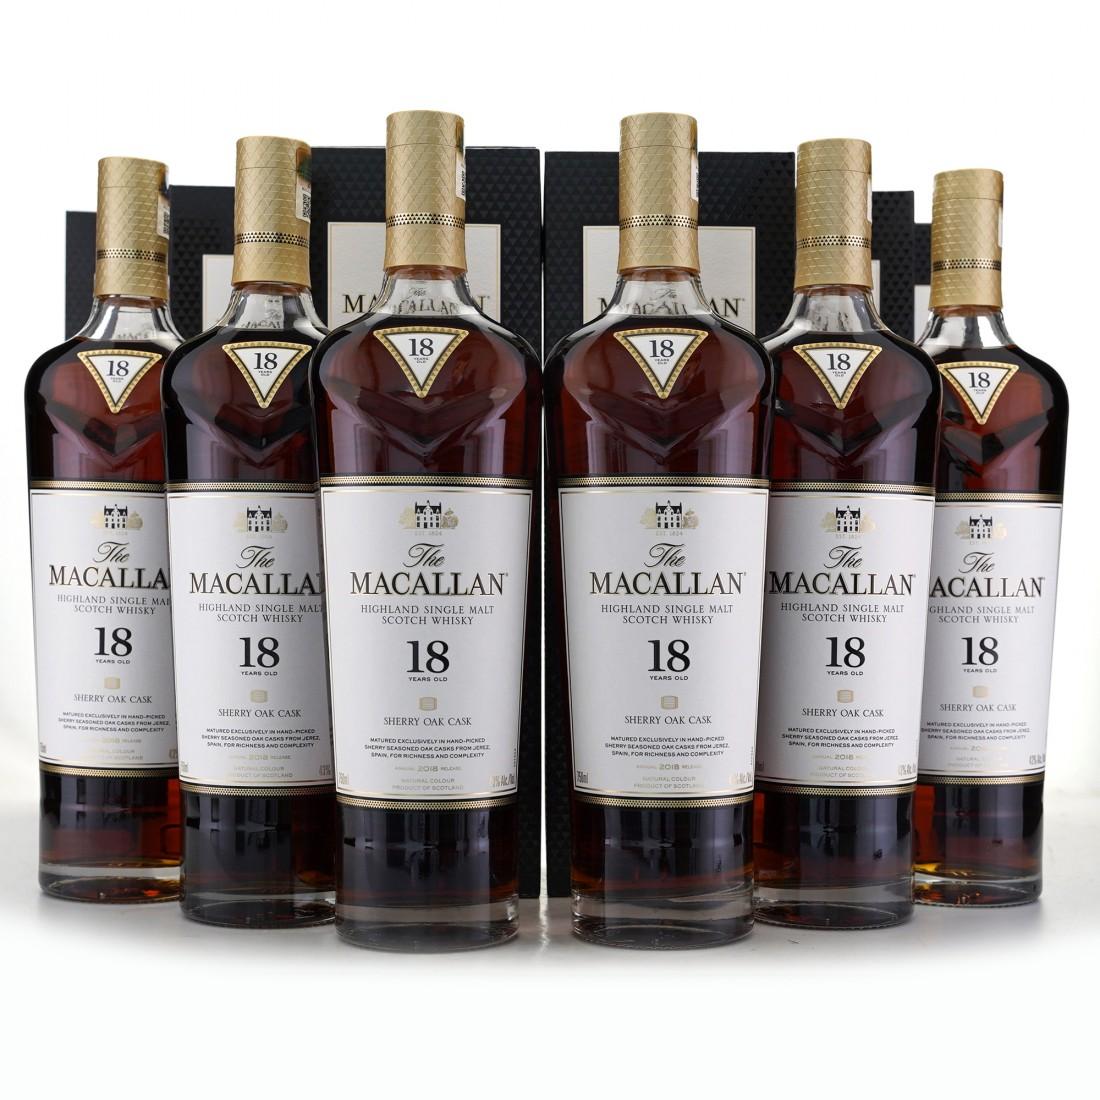 Macallan 18 Year Old Sherry Oak 2018 Release 6 x 75cl / US Import - Case